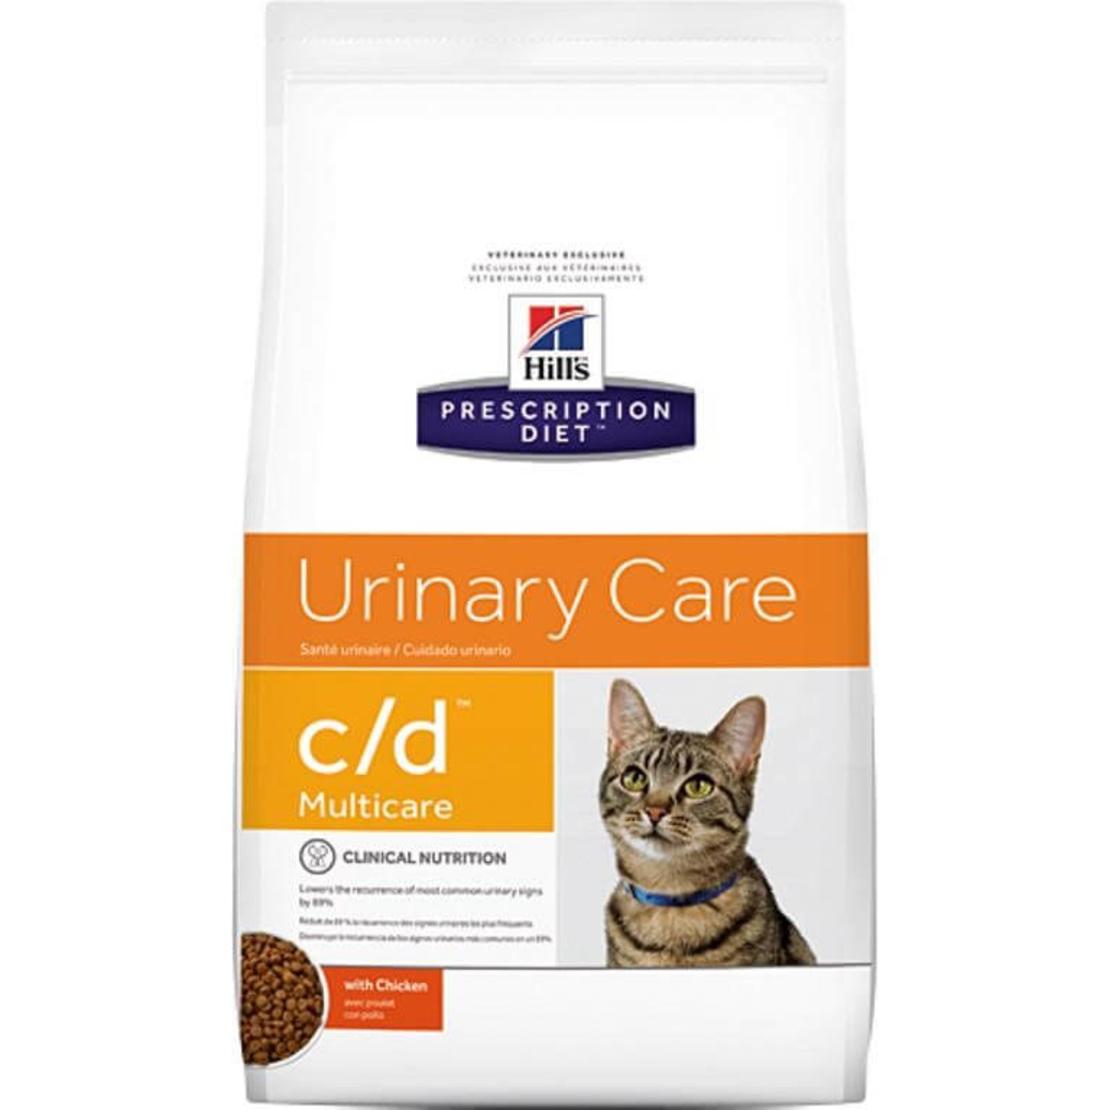 Hill's Prescription Diet C/D הילס C/D מזון רפואי לחתול 10 ק